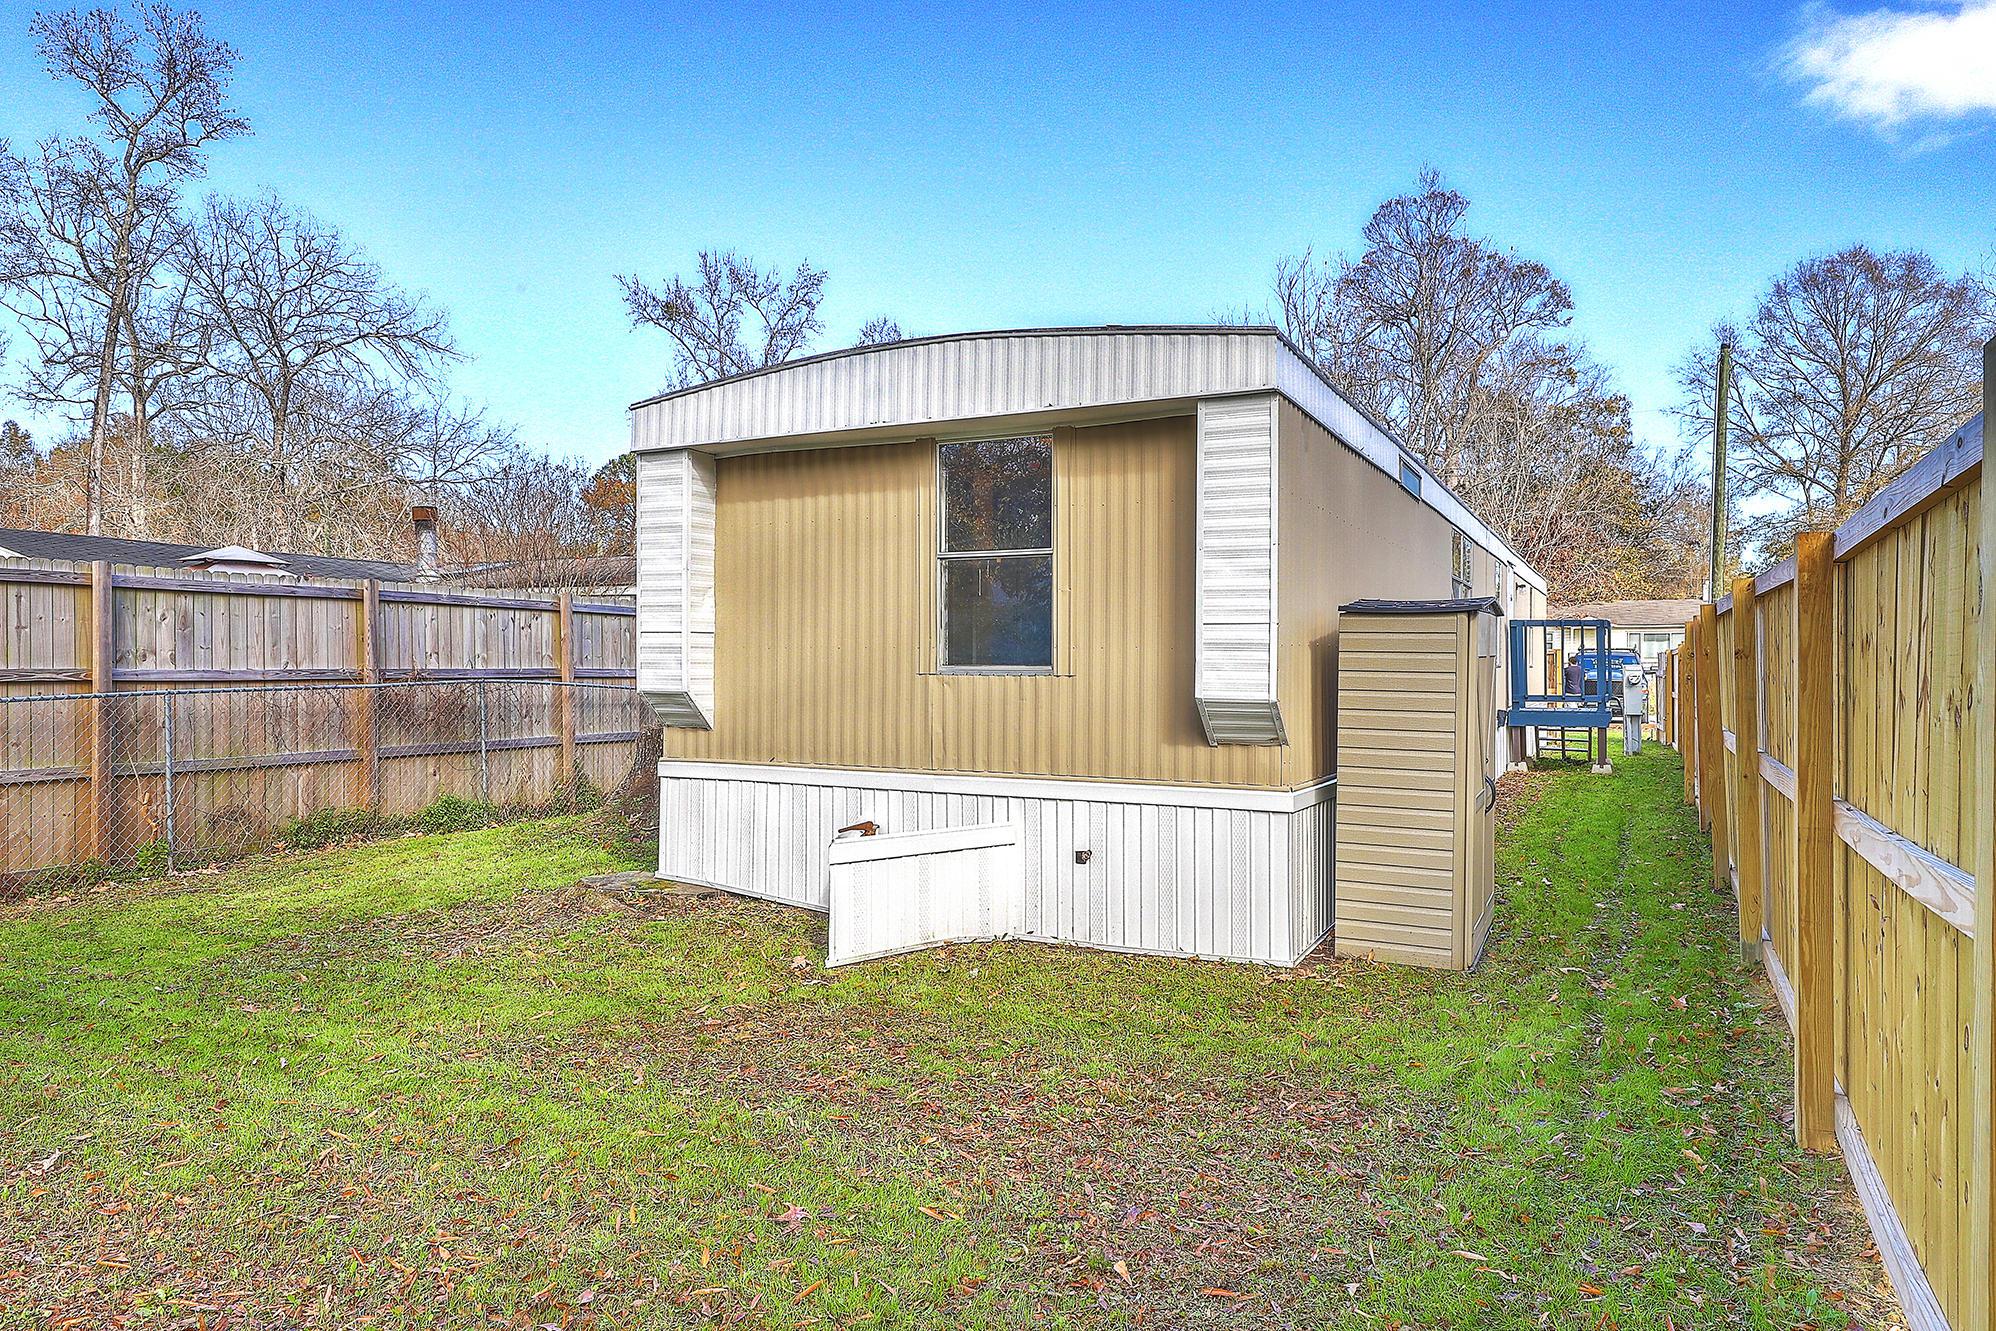 Caromi Village Homes For Sale - 323 Raymond, Ladson, SC - 9